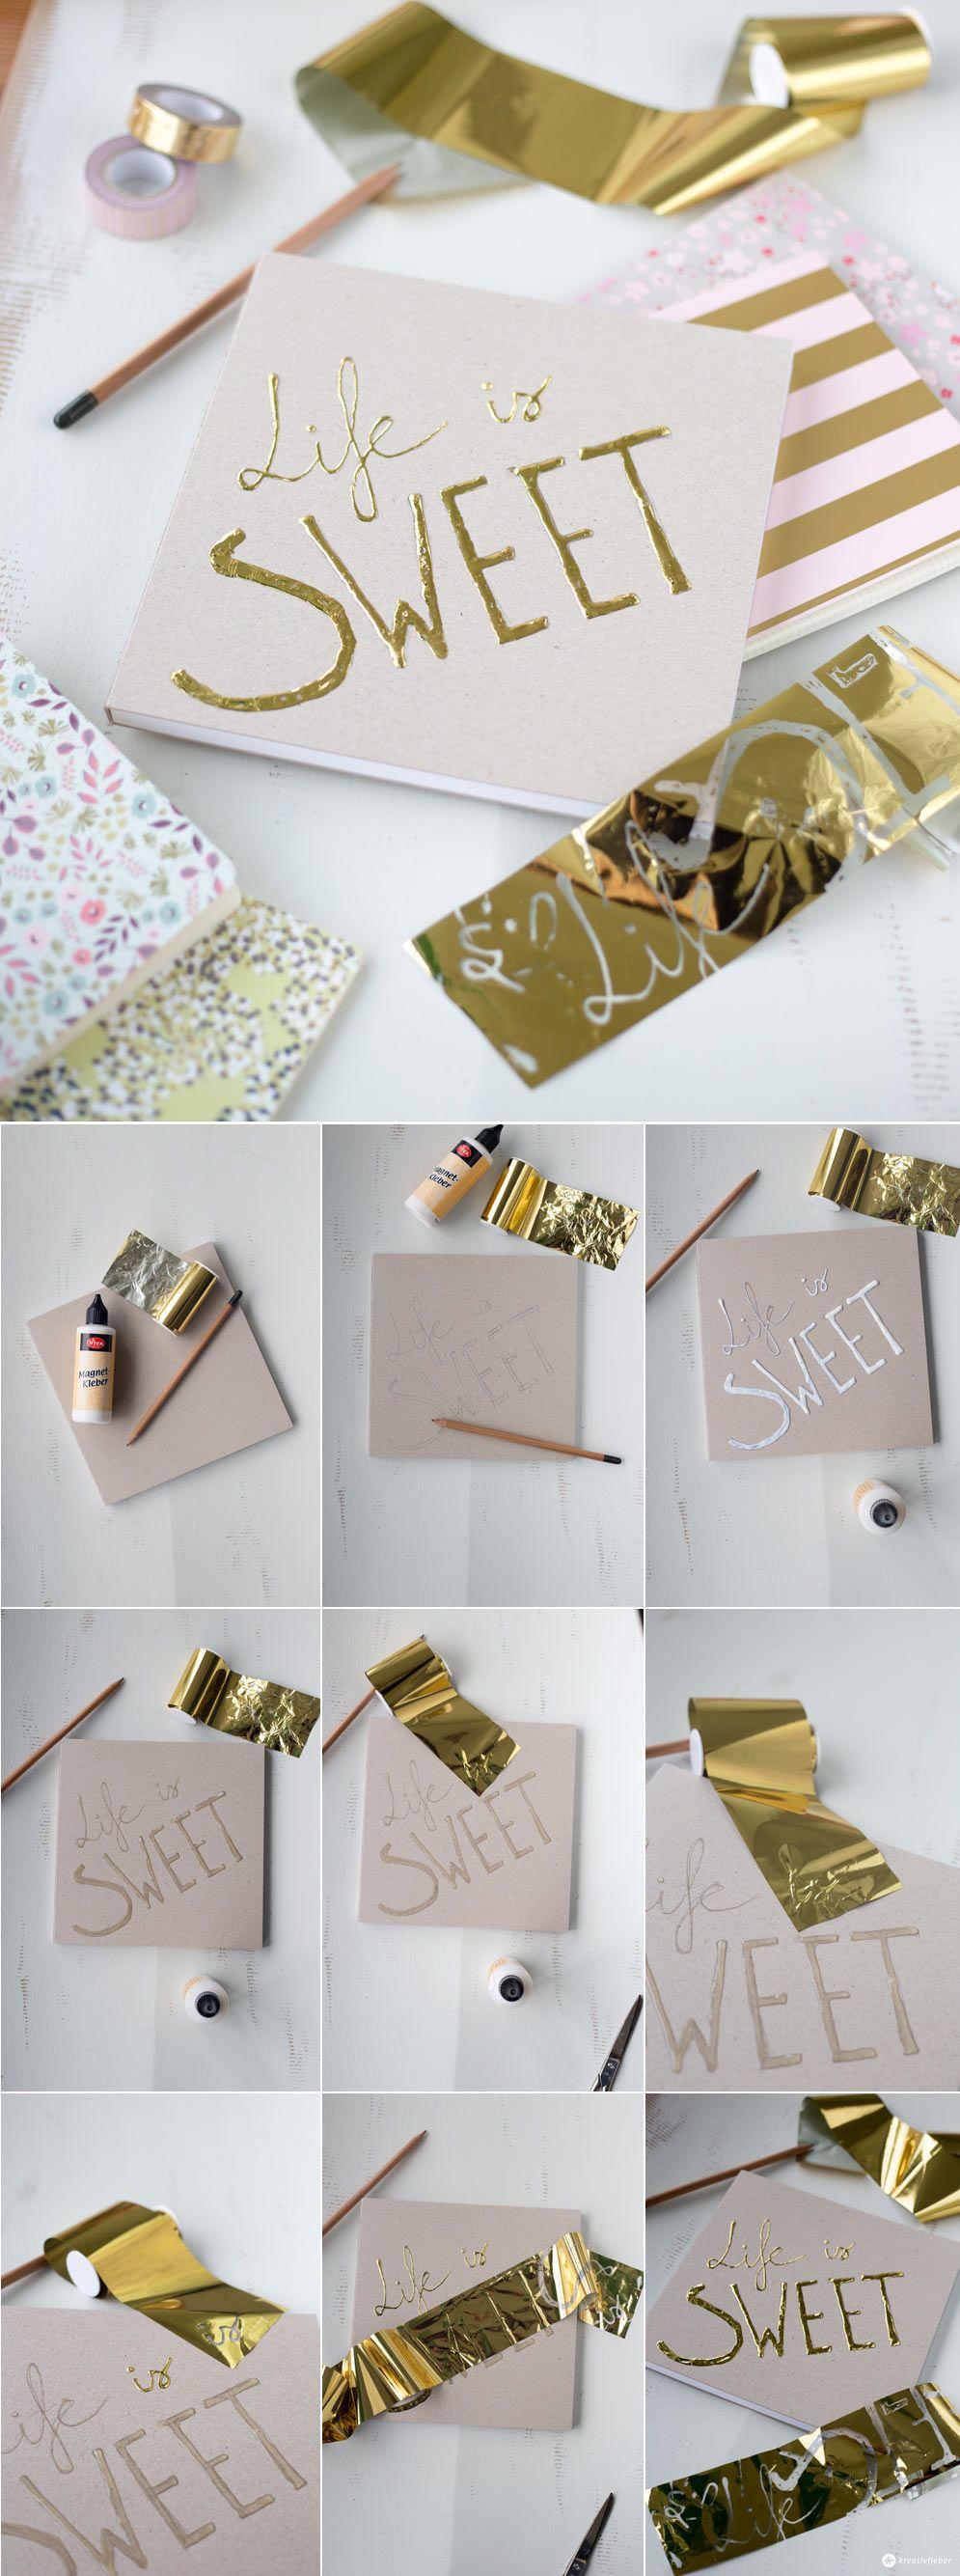 diy geschenkidee rezeptbuch mit goldschrift selbermachen diy geschenkideen pinterest. Black Bedroom Furniture Sets. Home Design Ideas